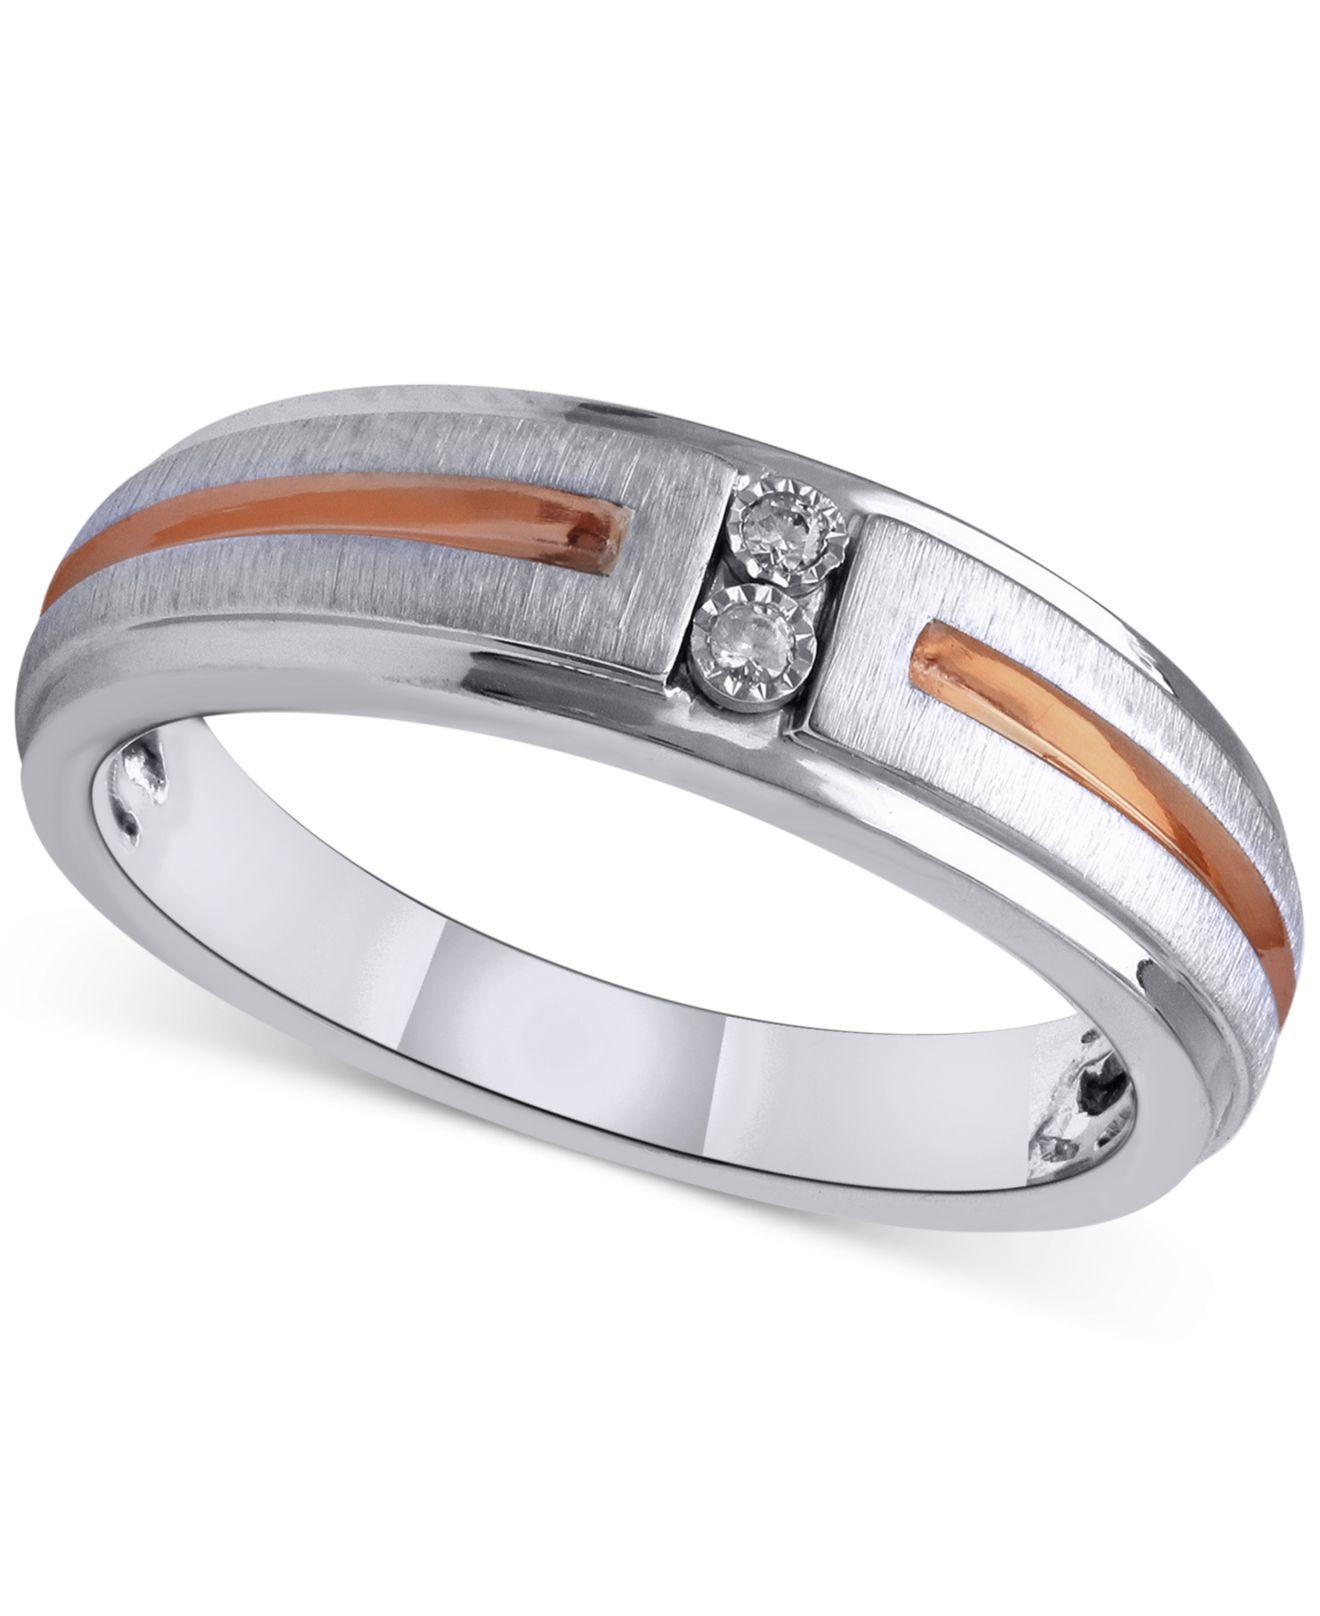 MACYS MENS WEDDING RINGS, MACY'S ADDS TUXEDO RENTAL WITH